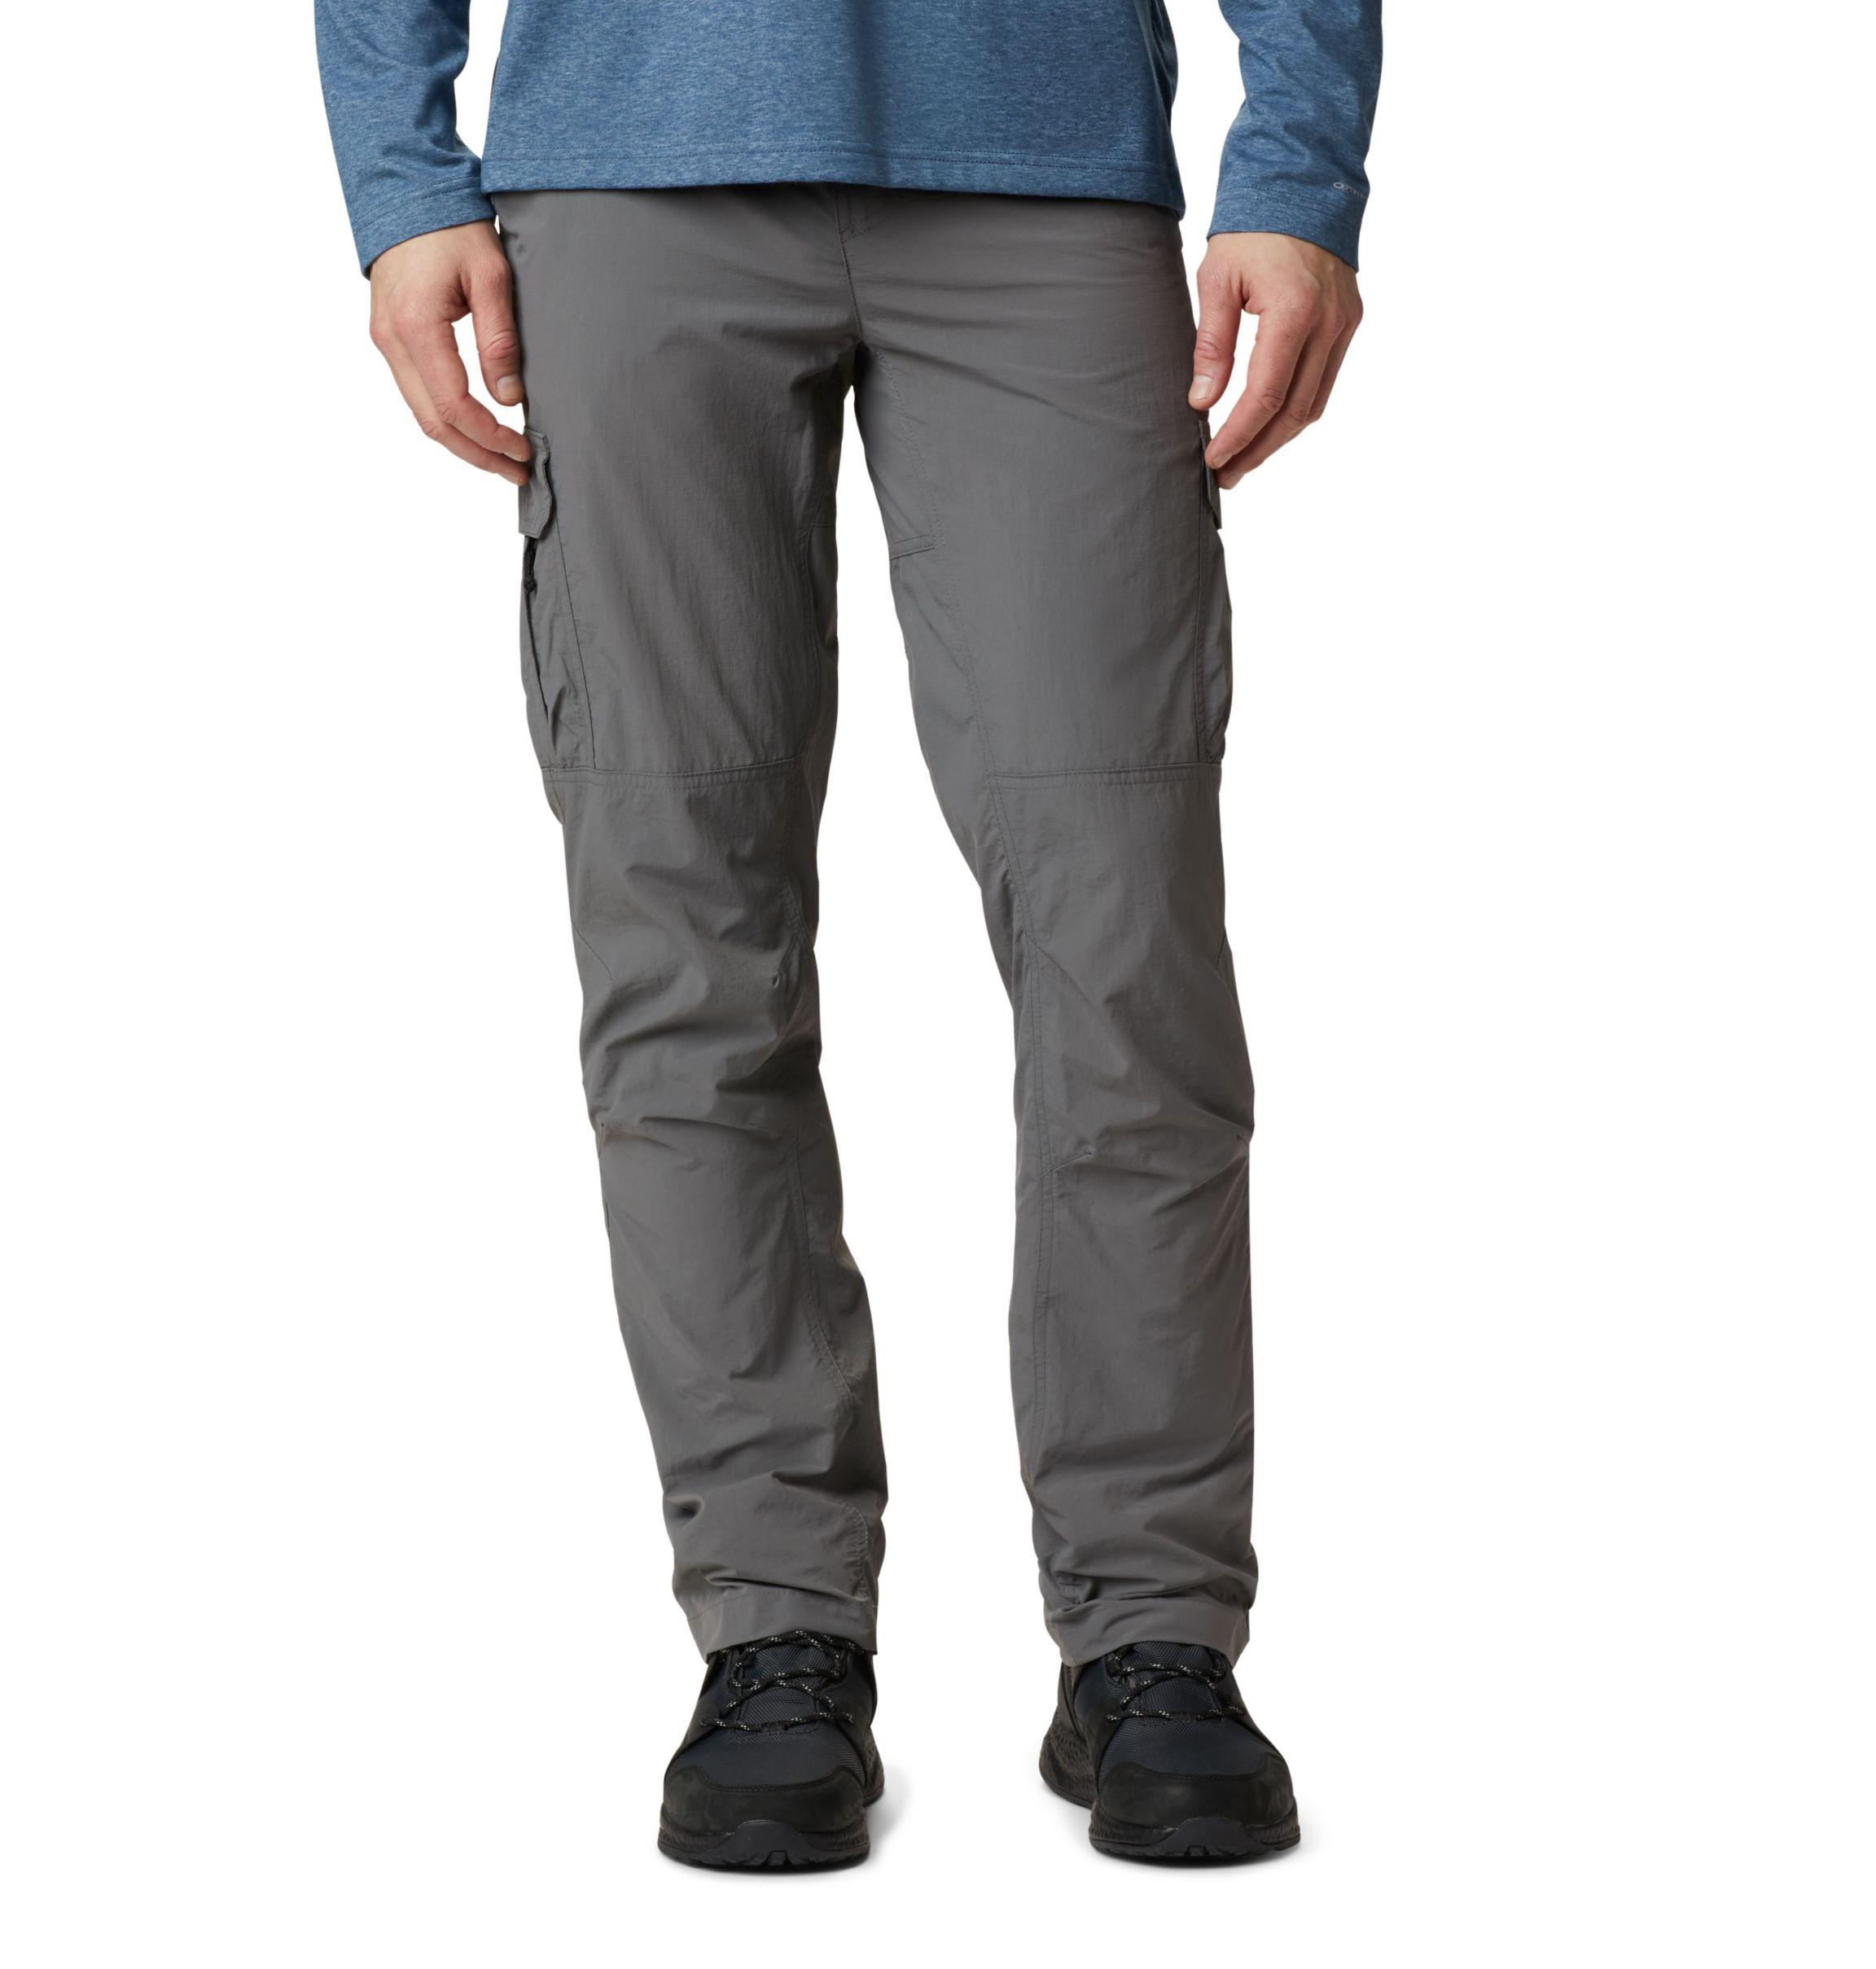 columbia-silver-ridge-ii-cargo-pant-city-grey-pantalon-randonnee-homme-1